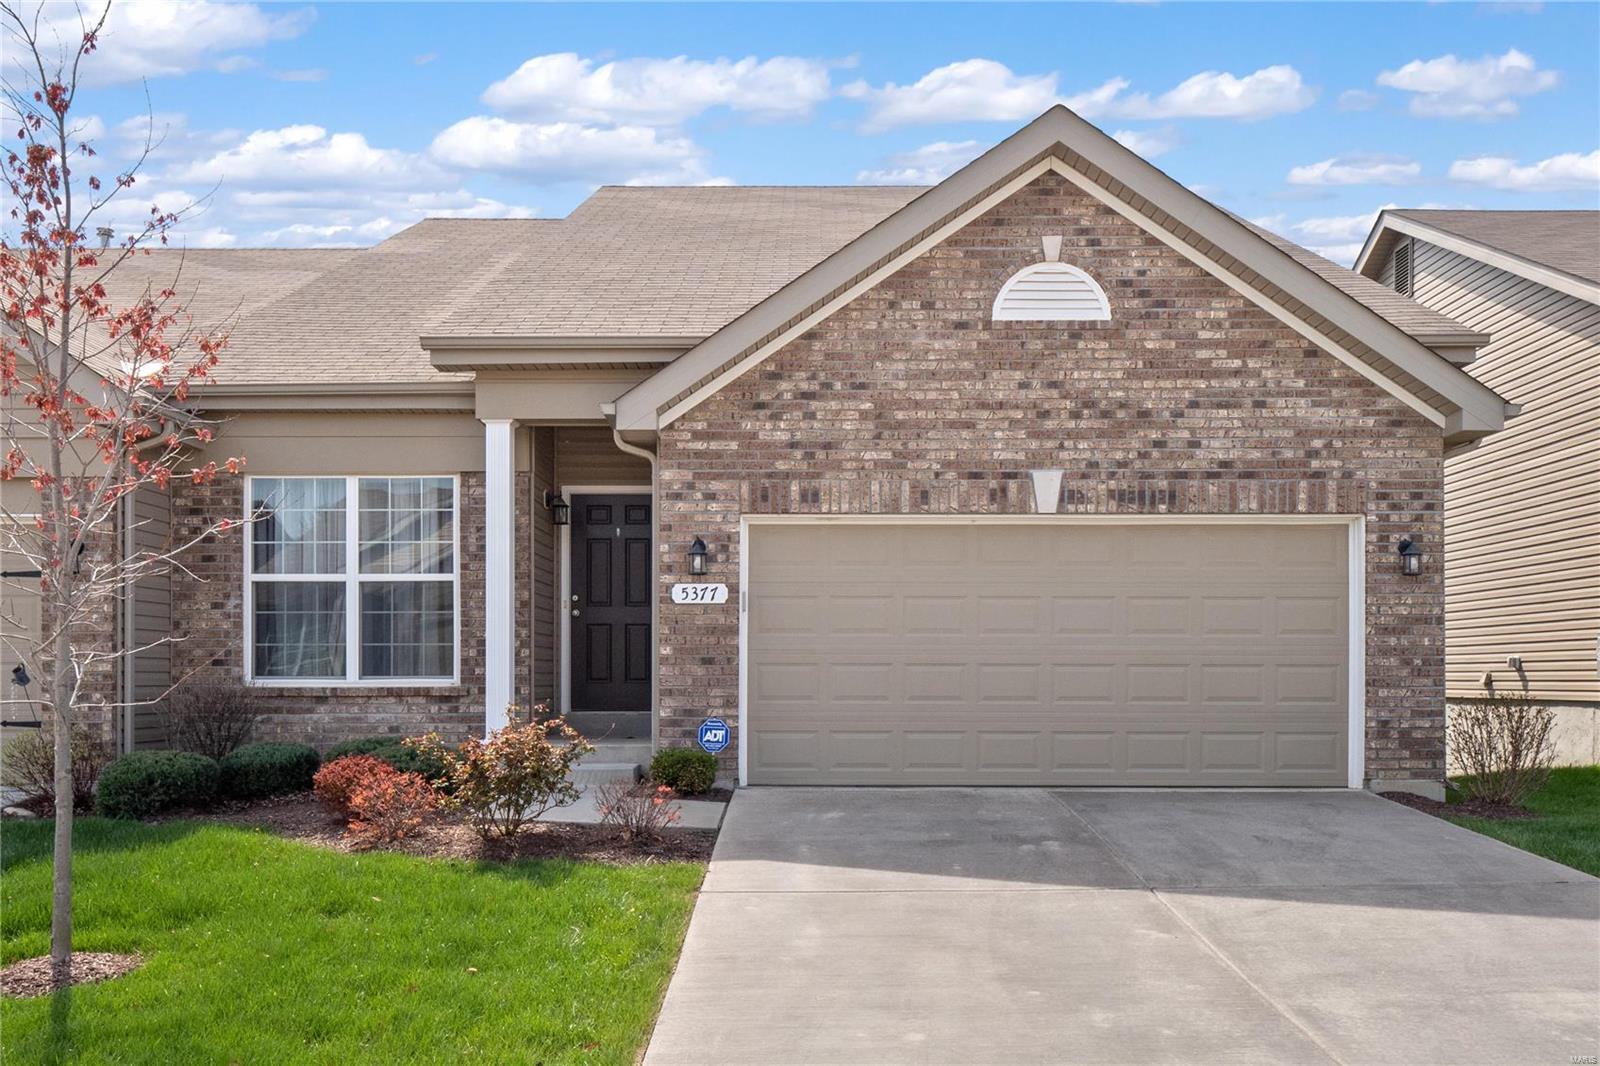 5377 Trailhead Court Property Photo - Eureka, MO real estate listing